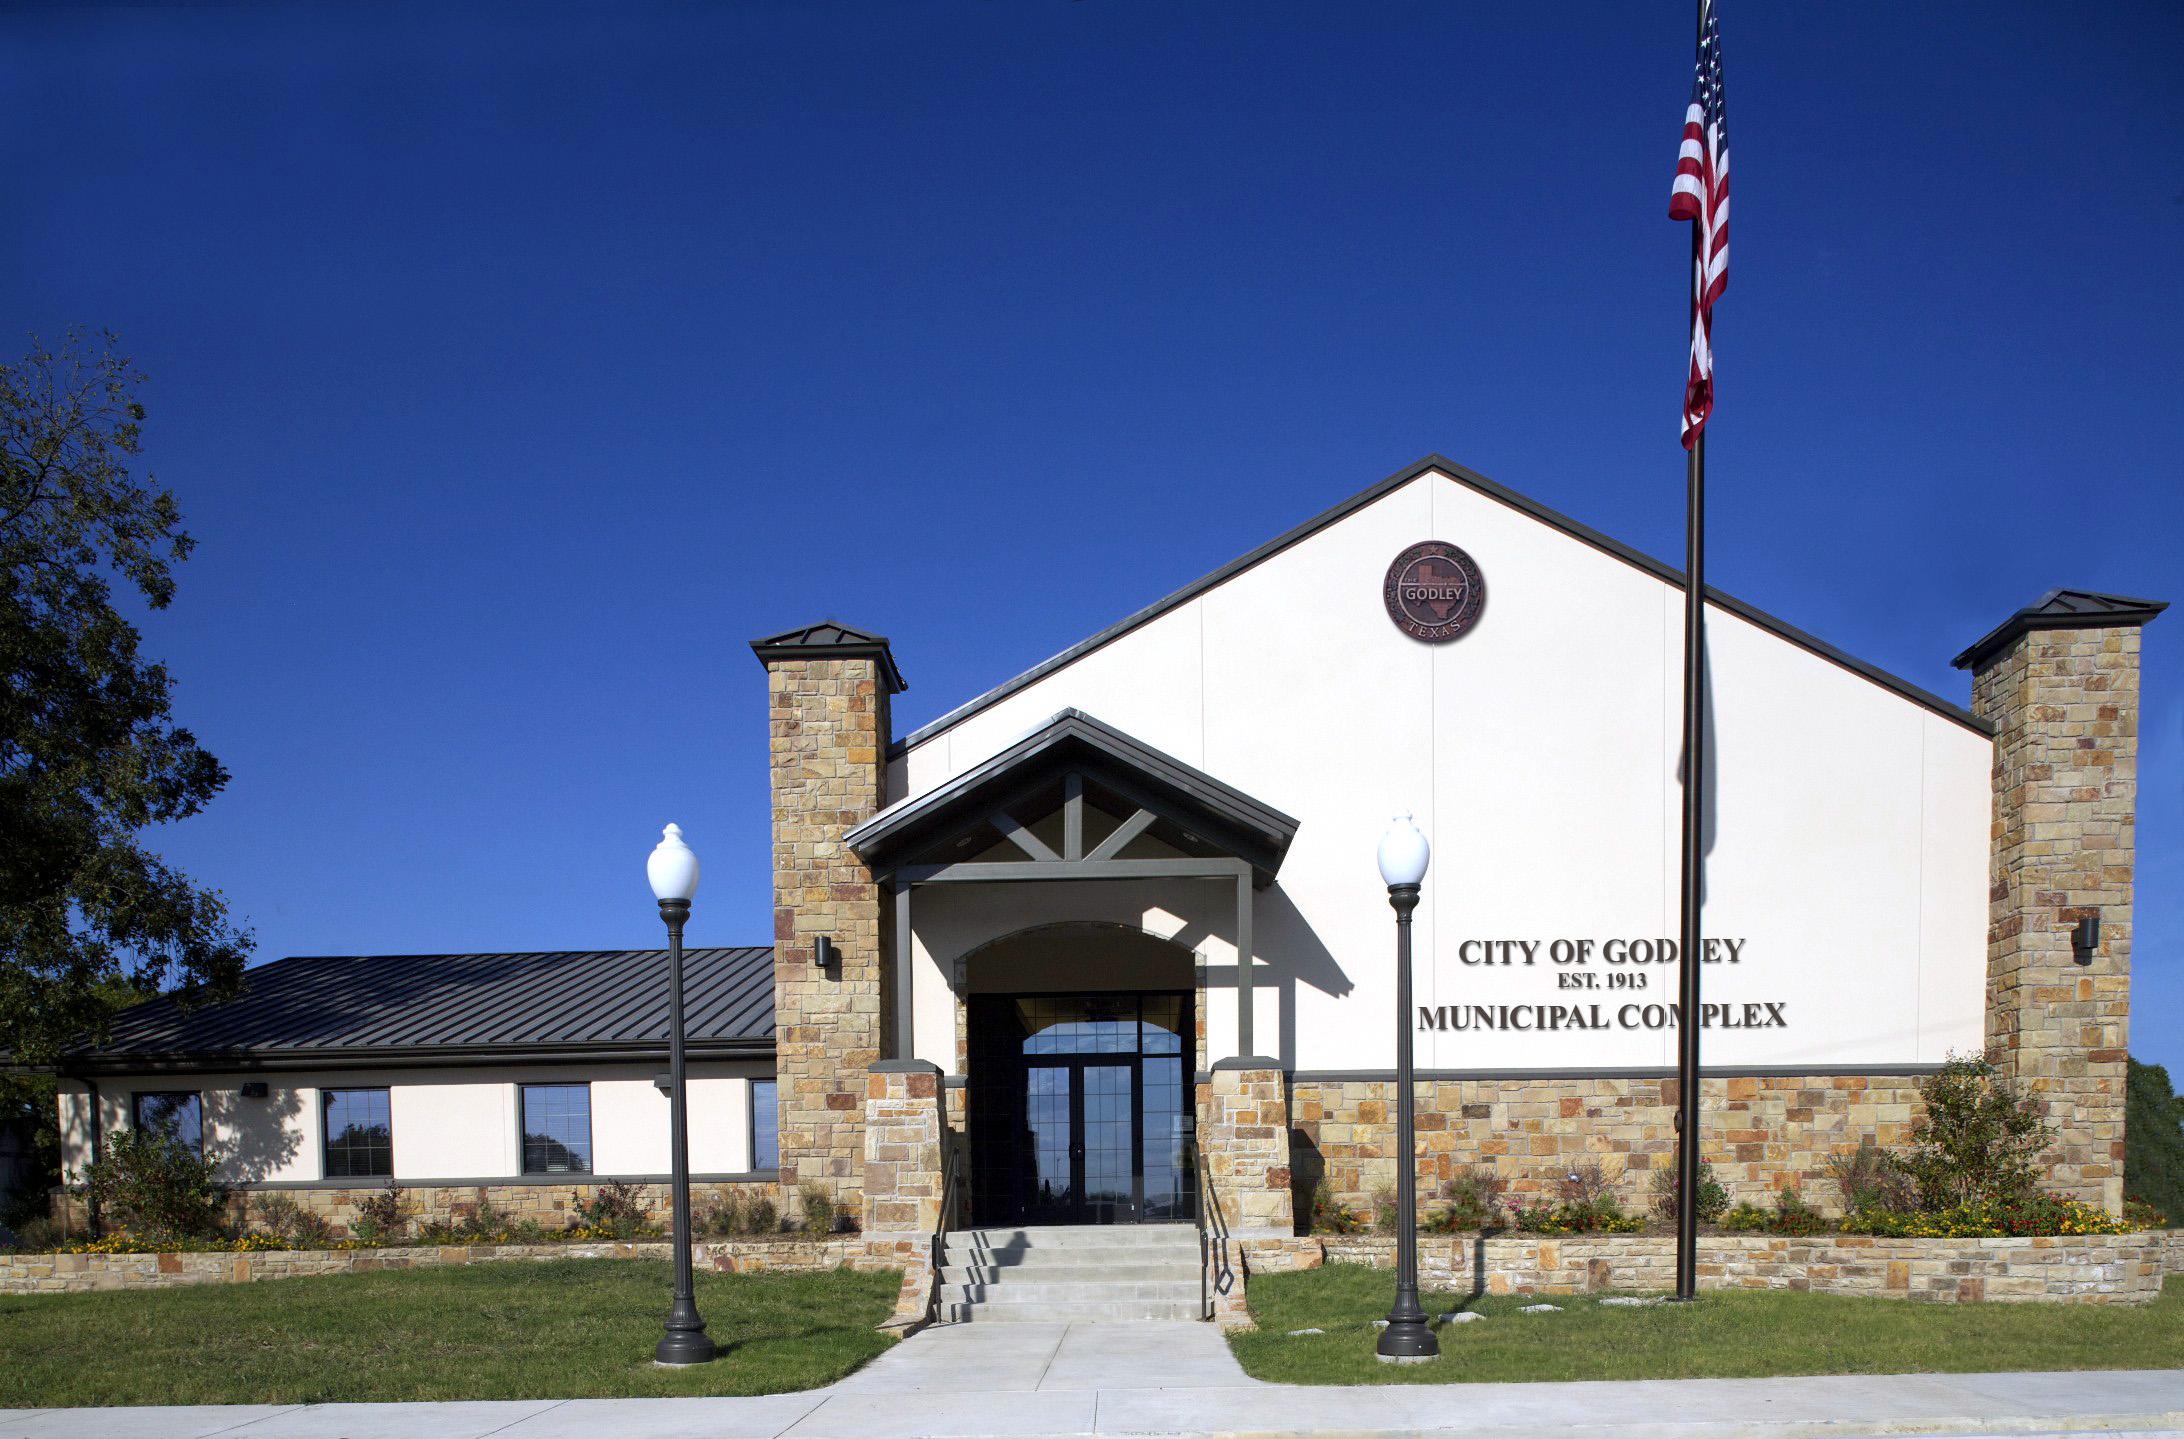 Godley Municipal Complex